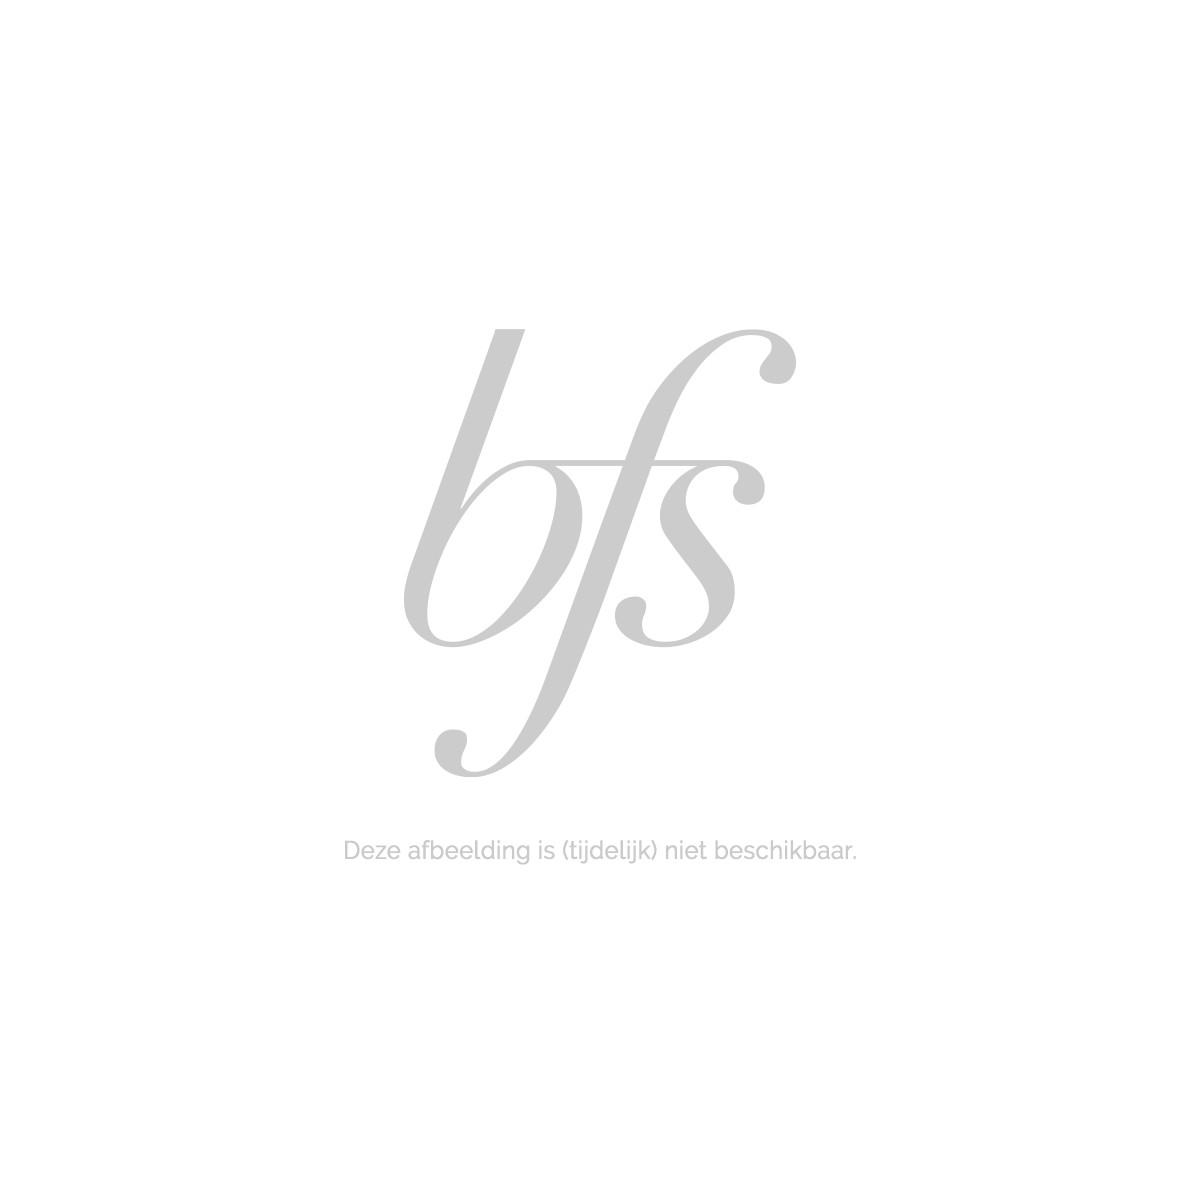 Alessandro Nsm Professional Manicure File 120/120 1 Piece